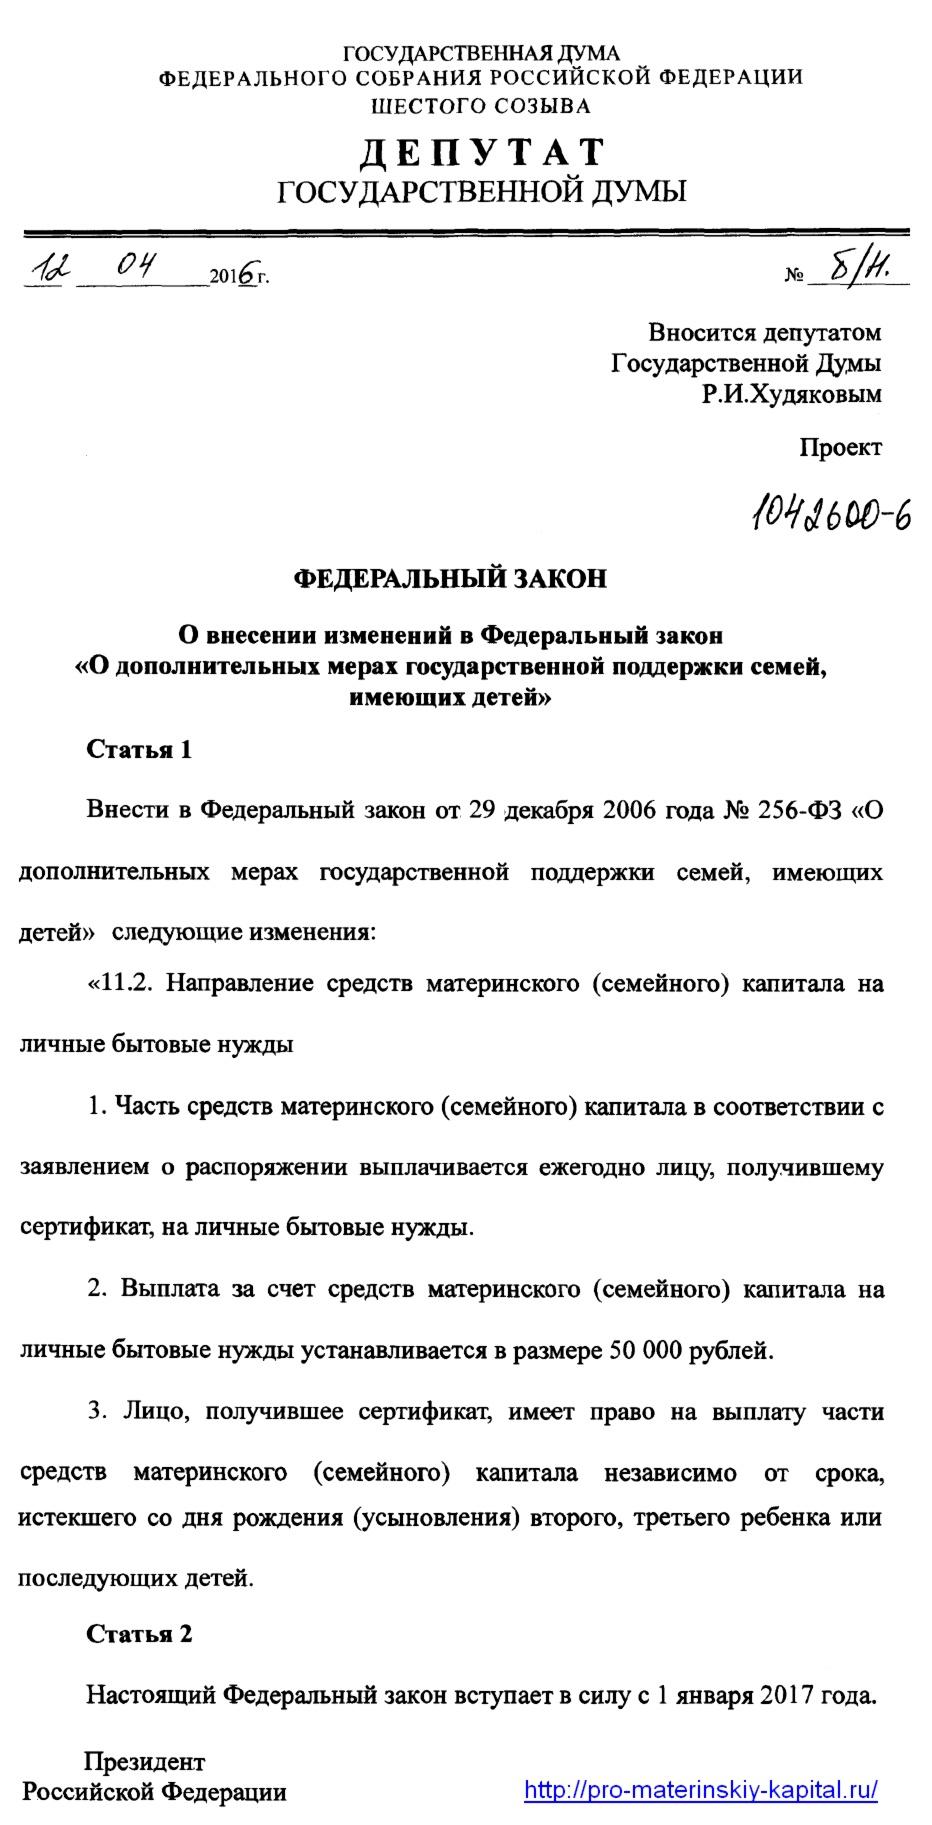 Аванс выдали 30 марта 2018 года